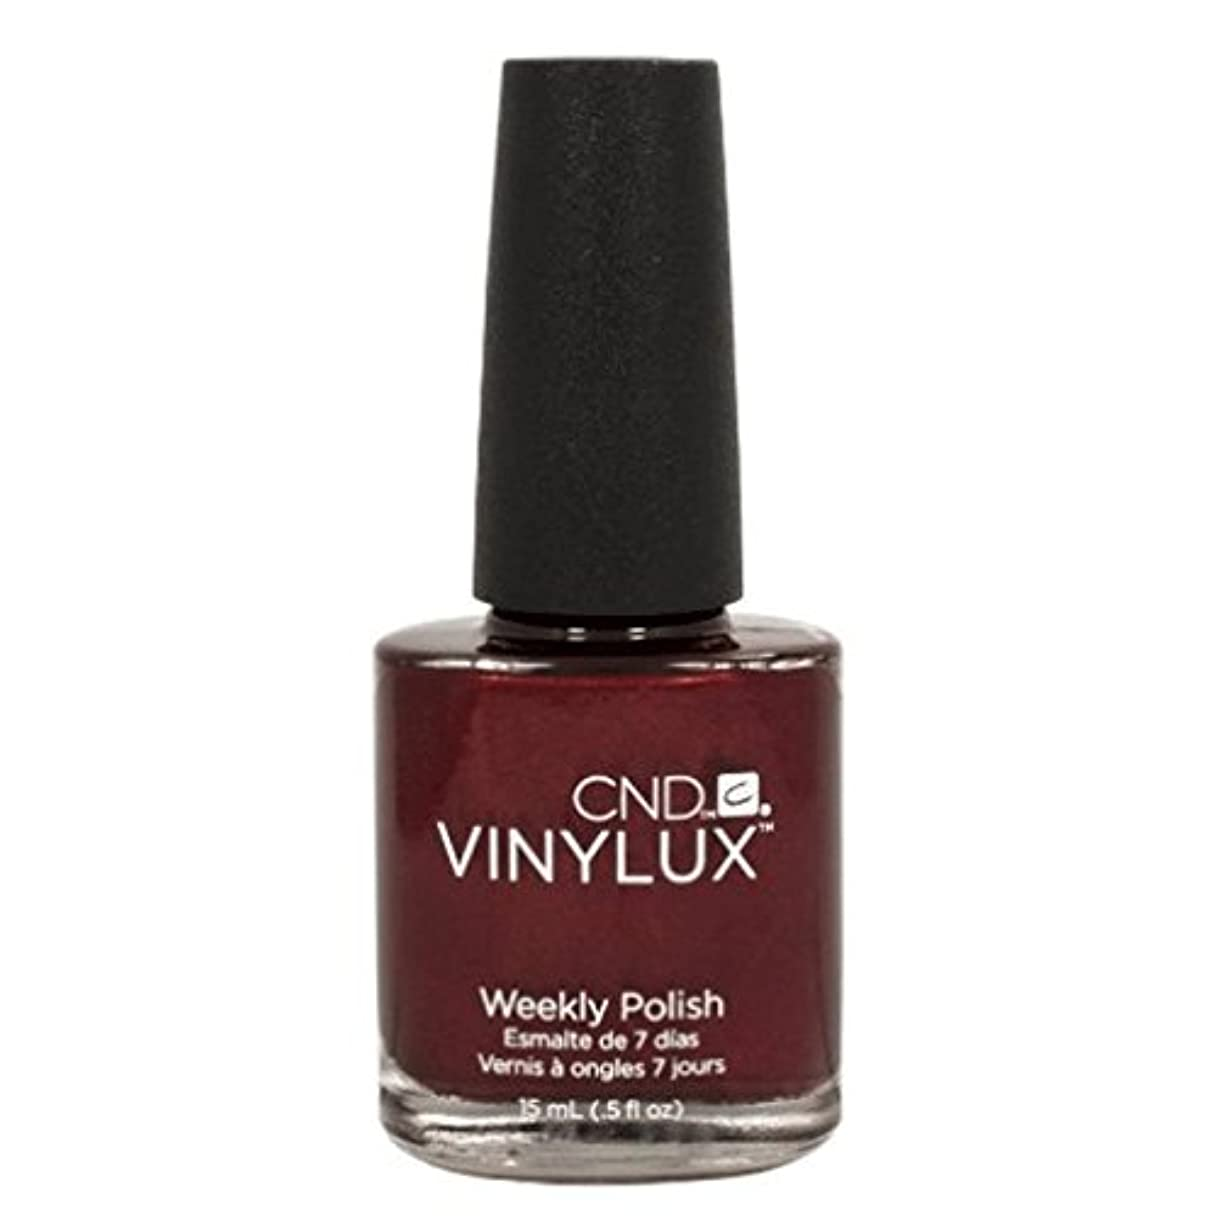 CND Vinylux Manicure Lacquer _  Masquerade #130 _15ml (0.5oz)